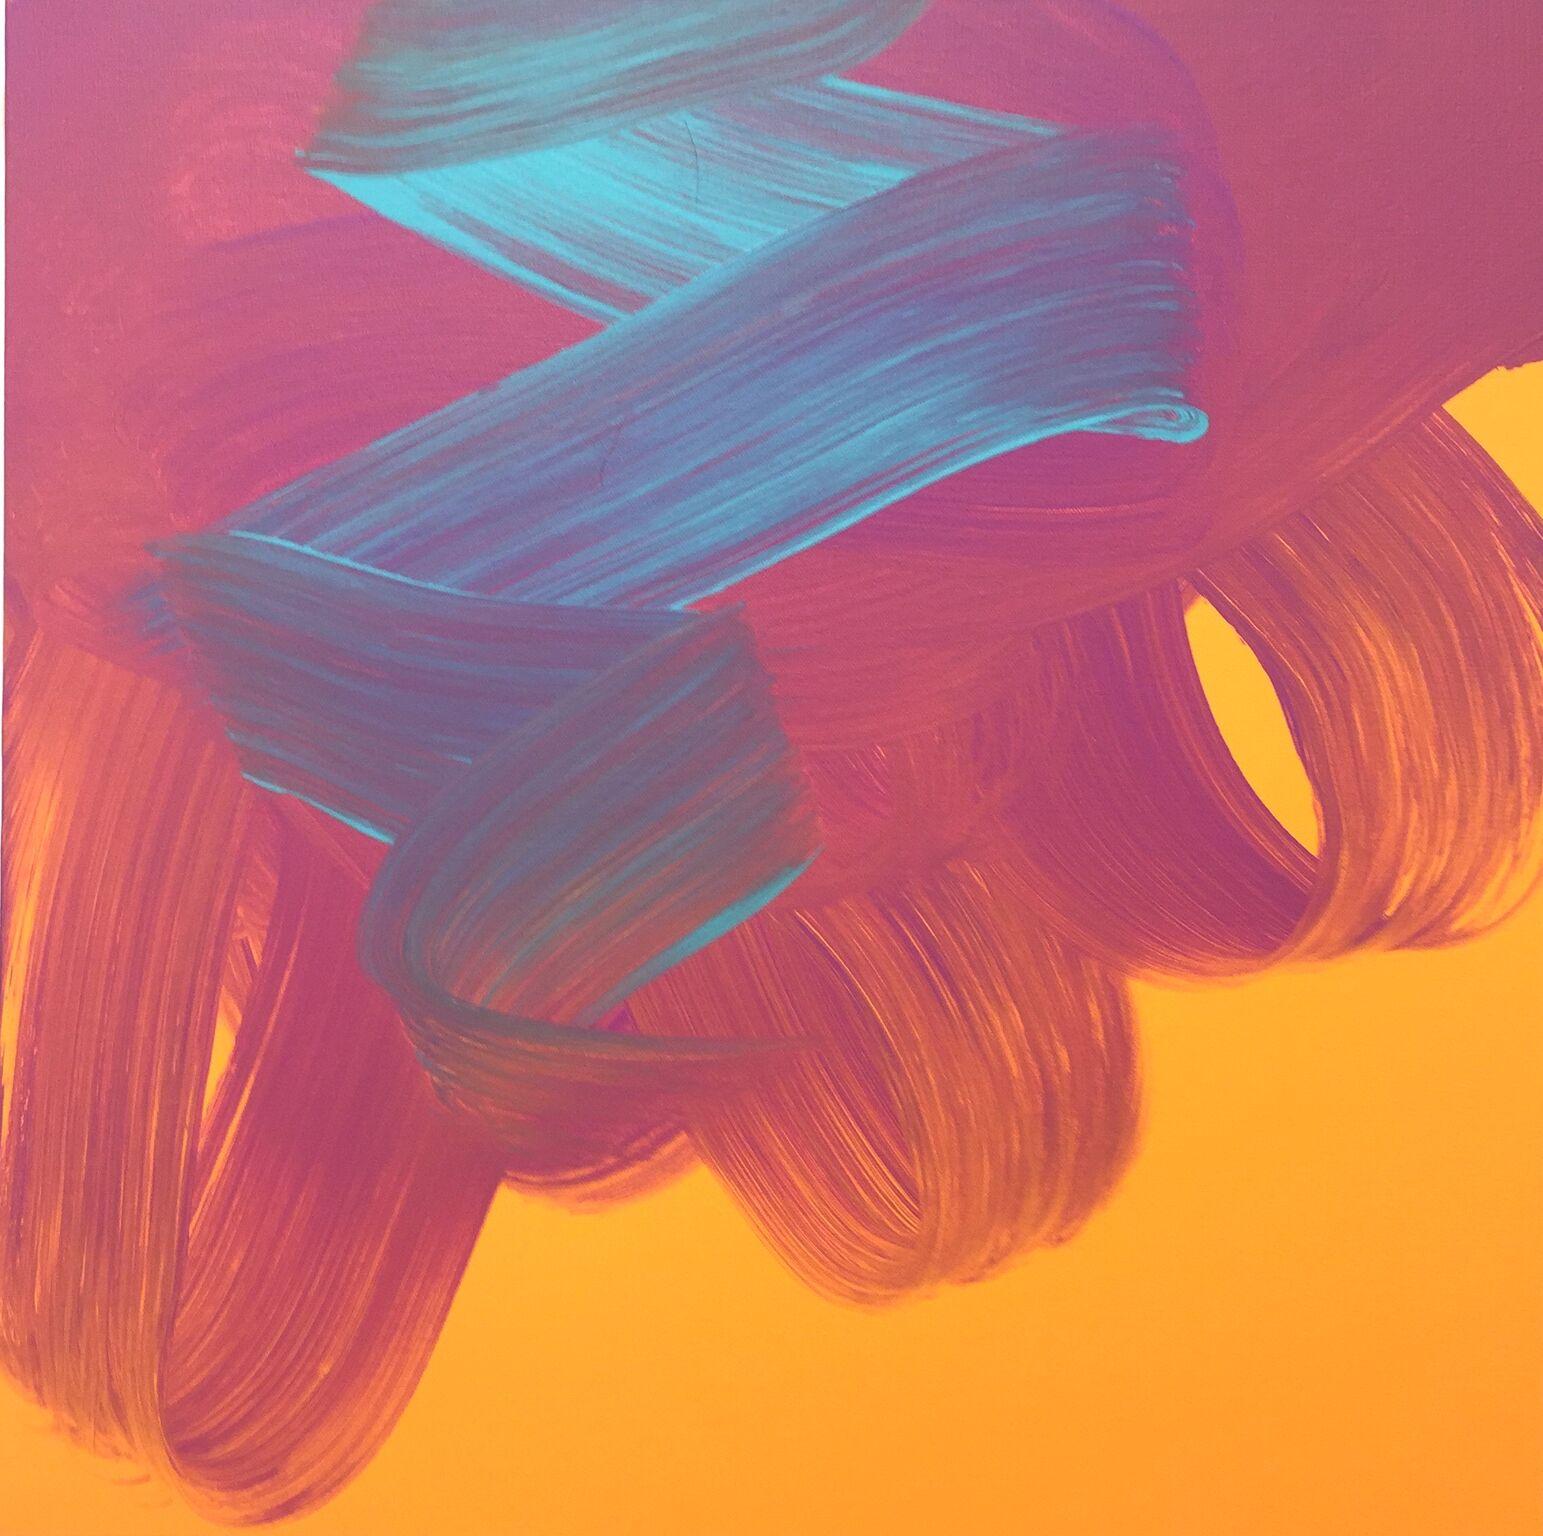 Jane Callister  Mad Sounds , 2017 Baroco-pop acrylic on canvas 24 x 24 in (61 x 61 cm)